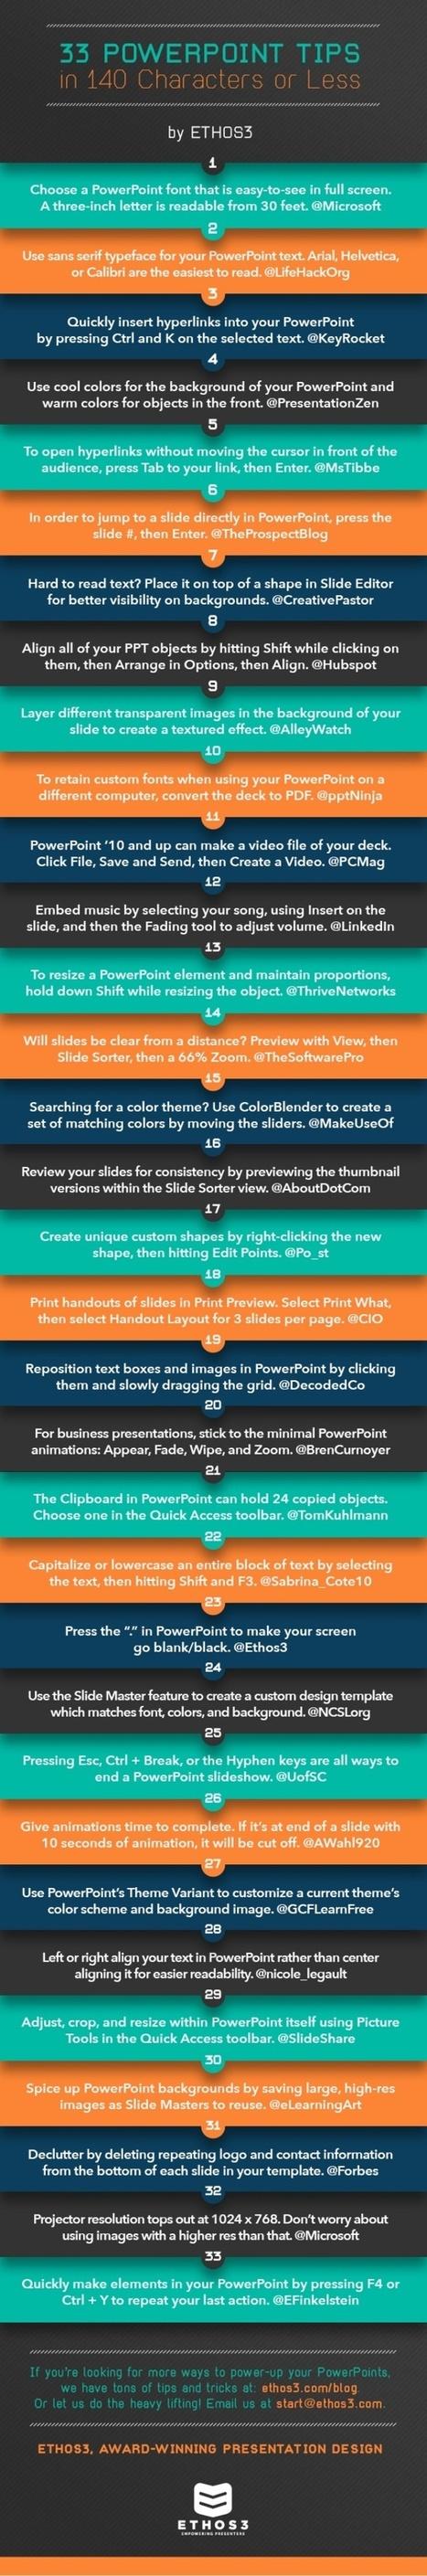 33 consejos sobre PowerPoint en 140 caracteres #infografia #infographic | Aprendiendo a Distancia | Scoop.it